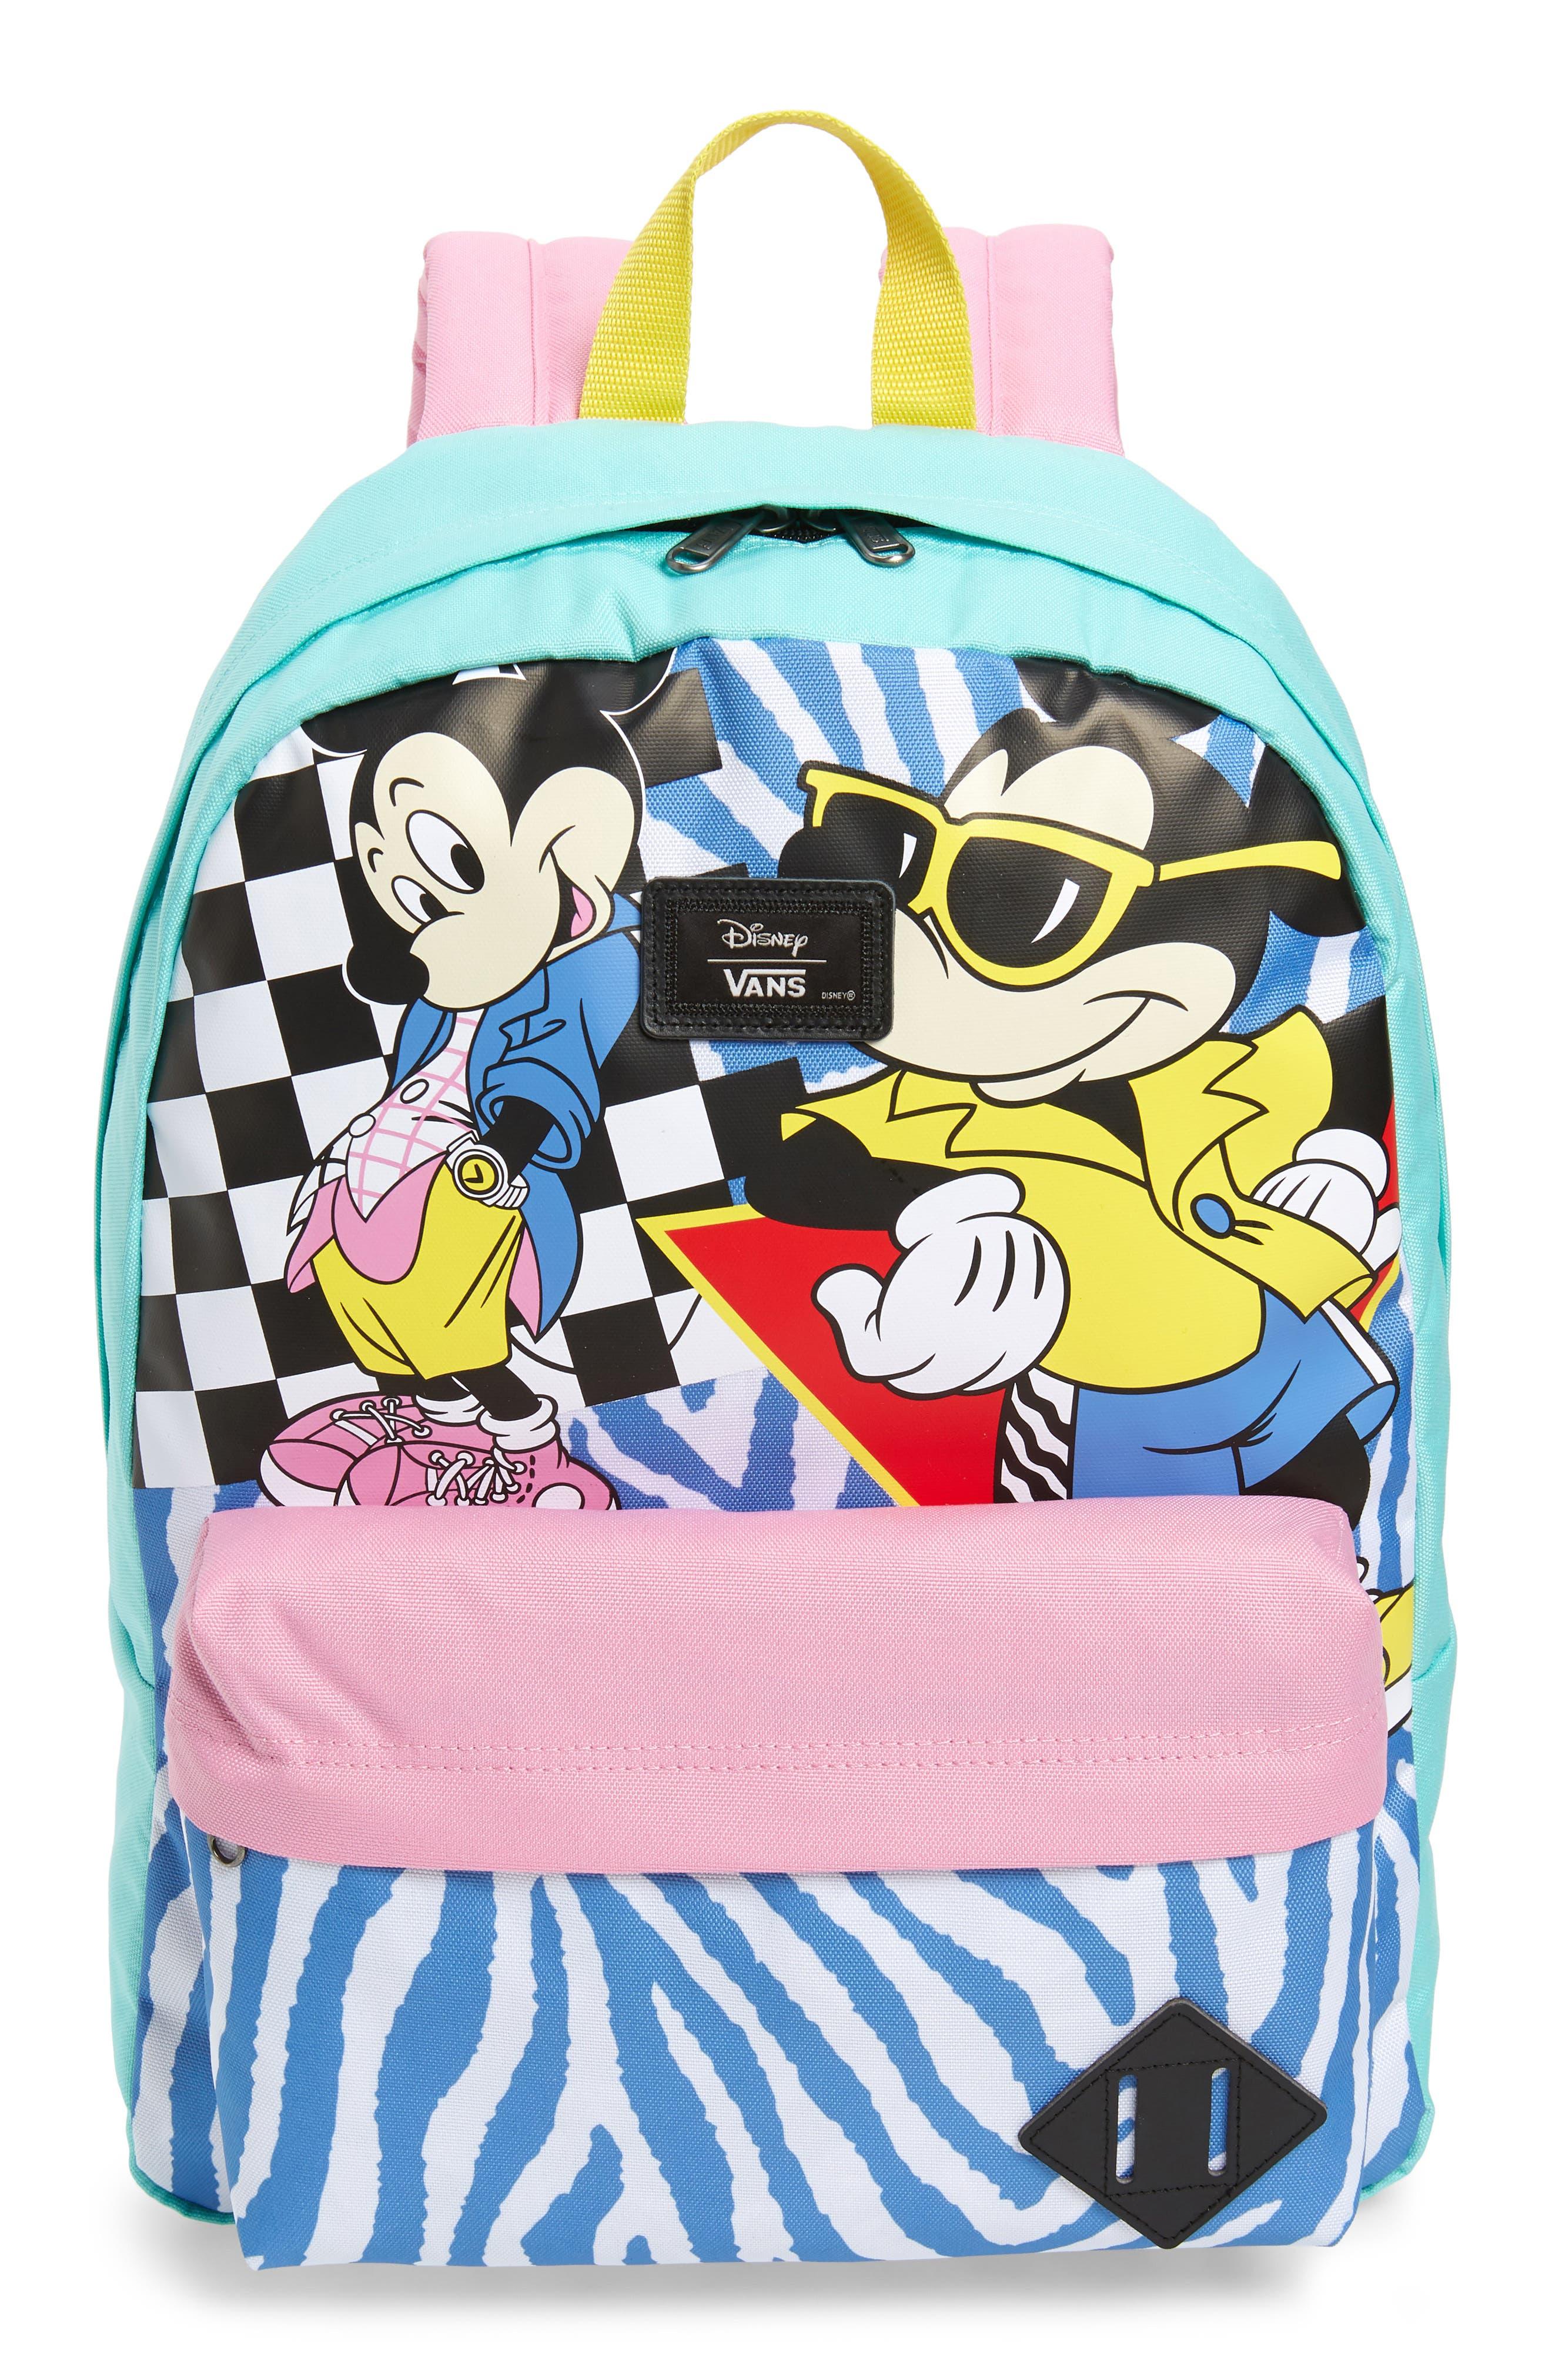 x Disney Mickey's 90th Anniversary - Retro Backpack,                         Main,                         color, 400